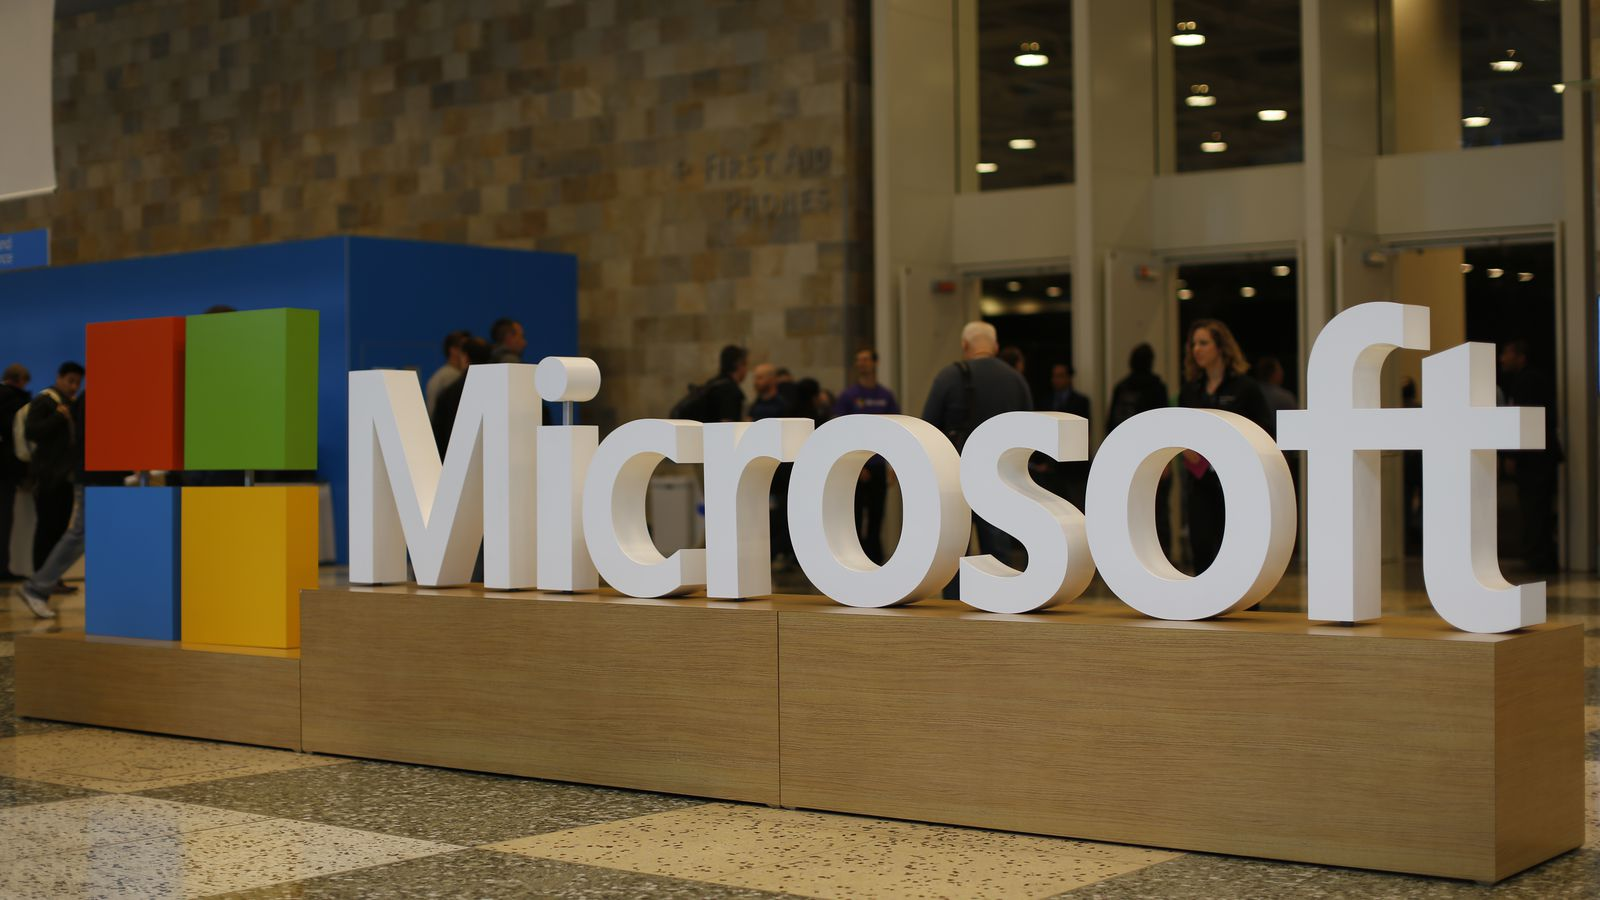 HQ Microsoft Wallpapers | File 139.28Kb